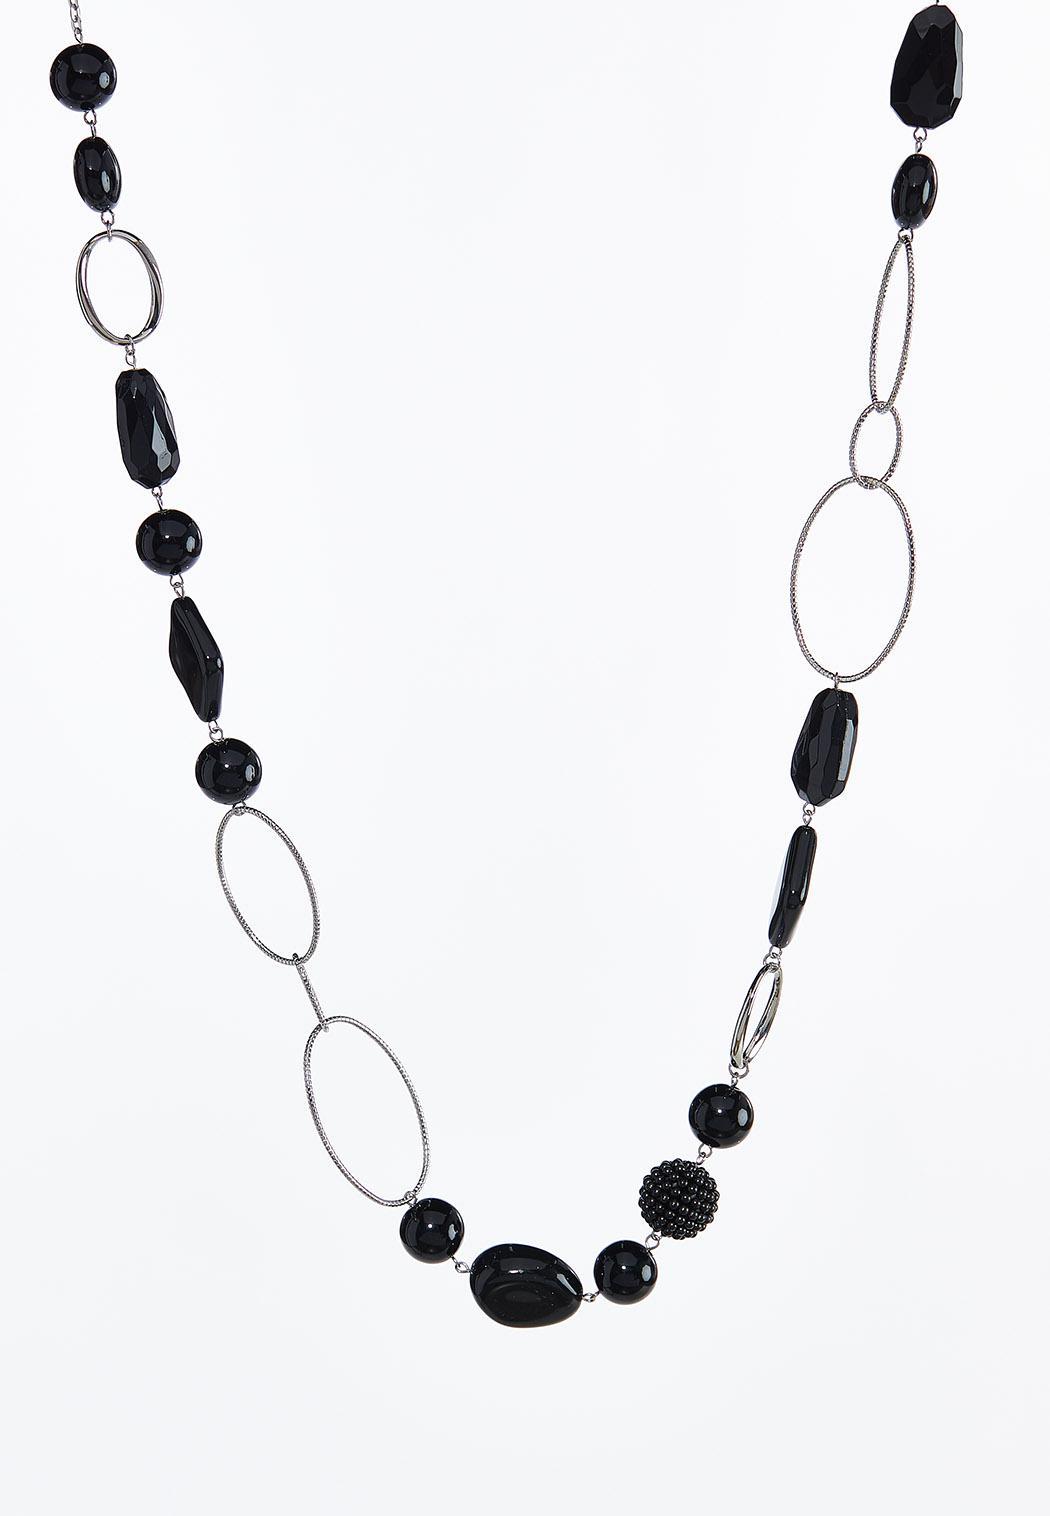 Color Chain Link Necklace